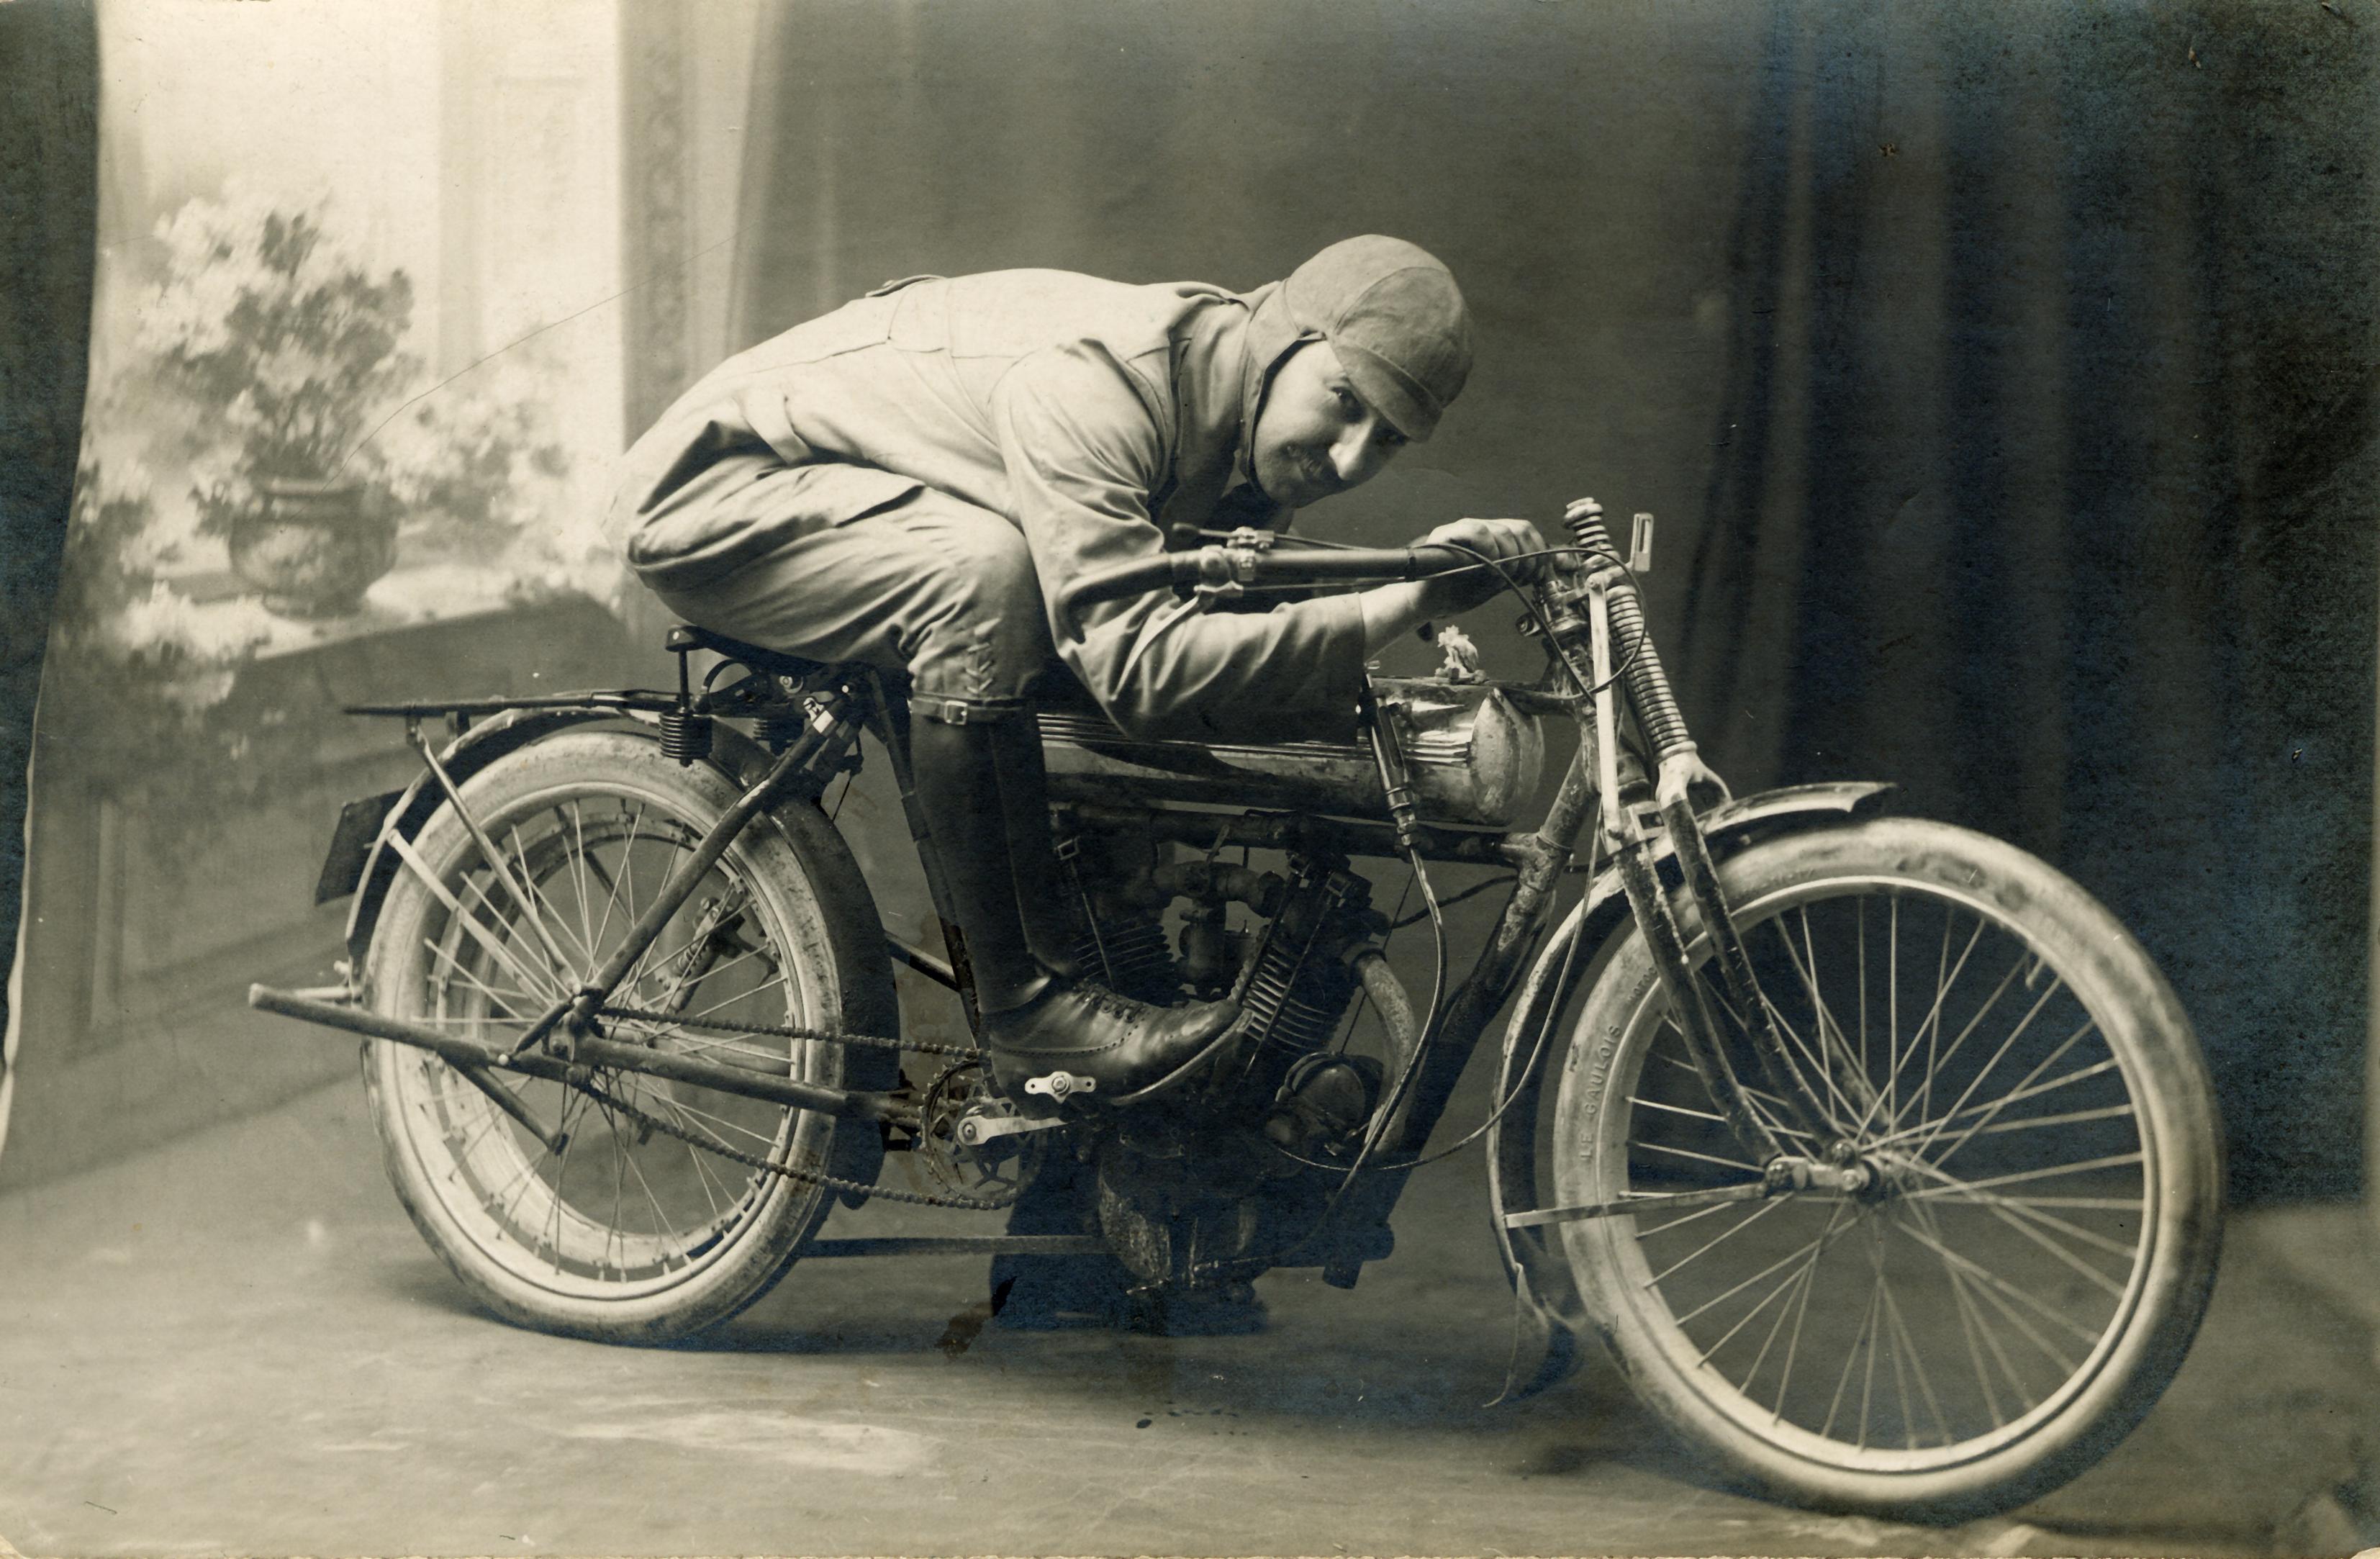 motos photos d'époque 49ffdf4ac5240f33